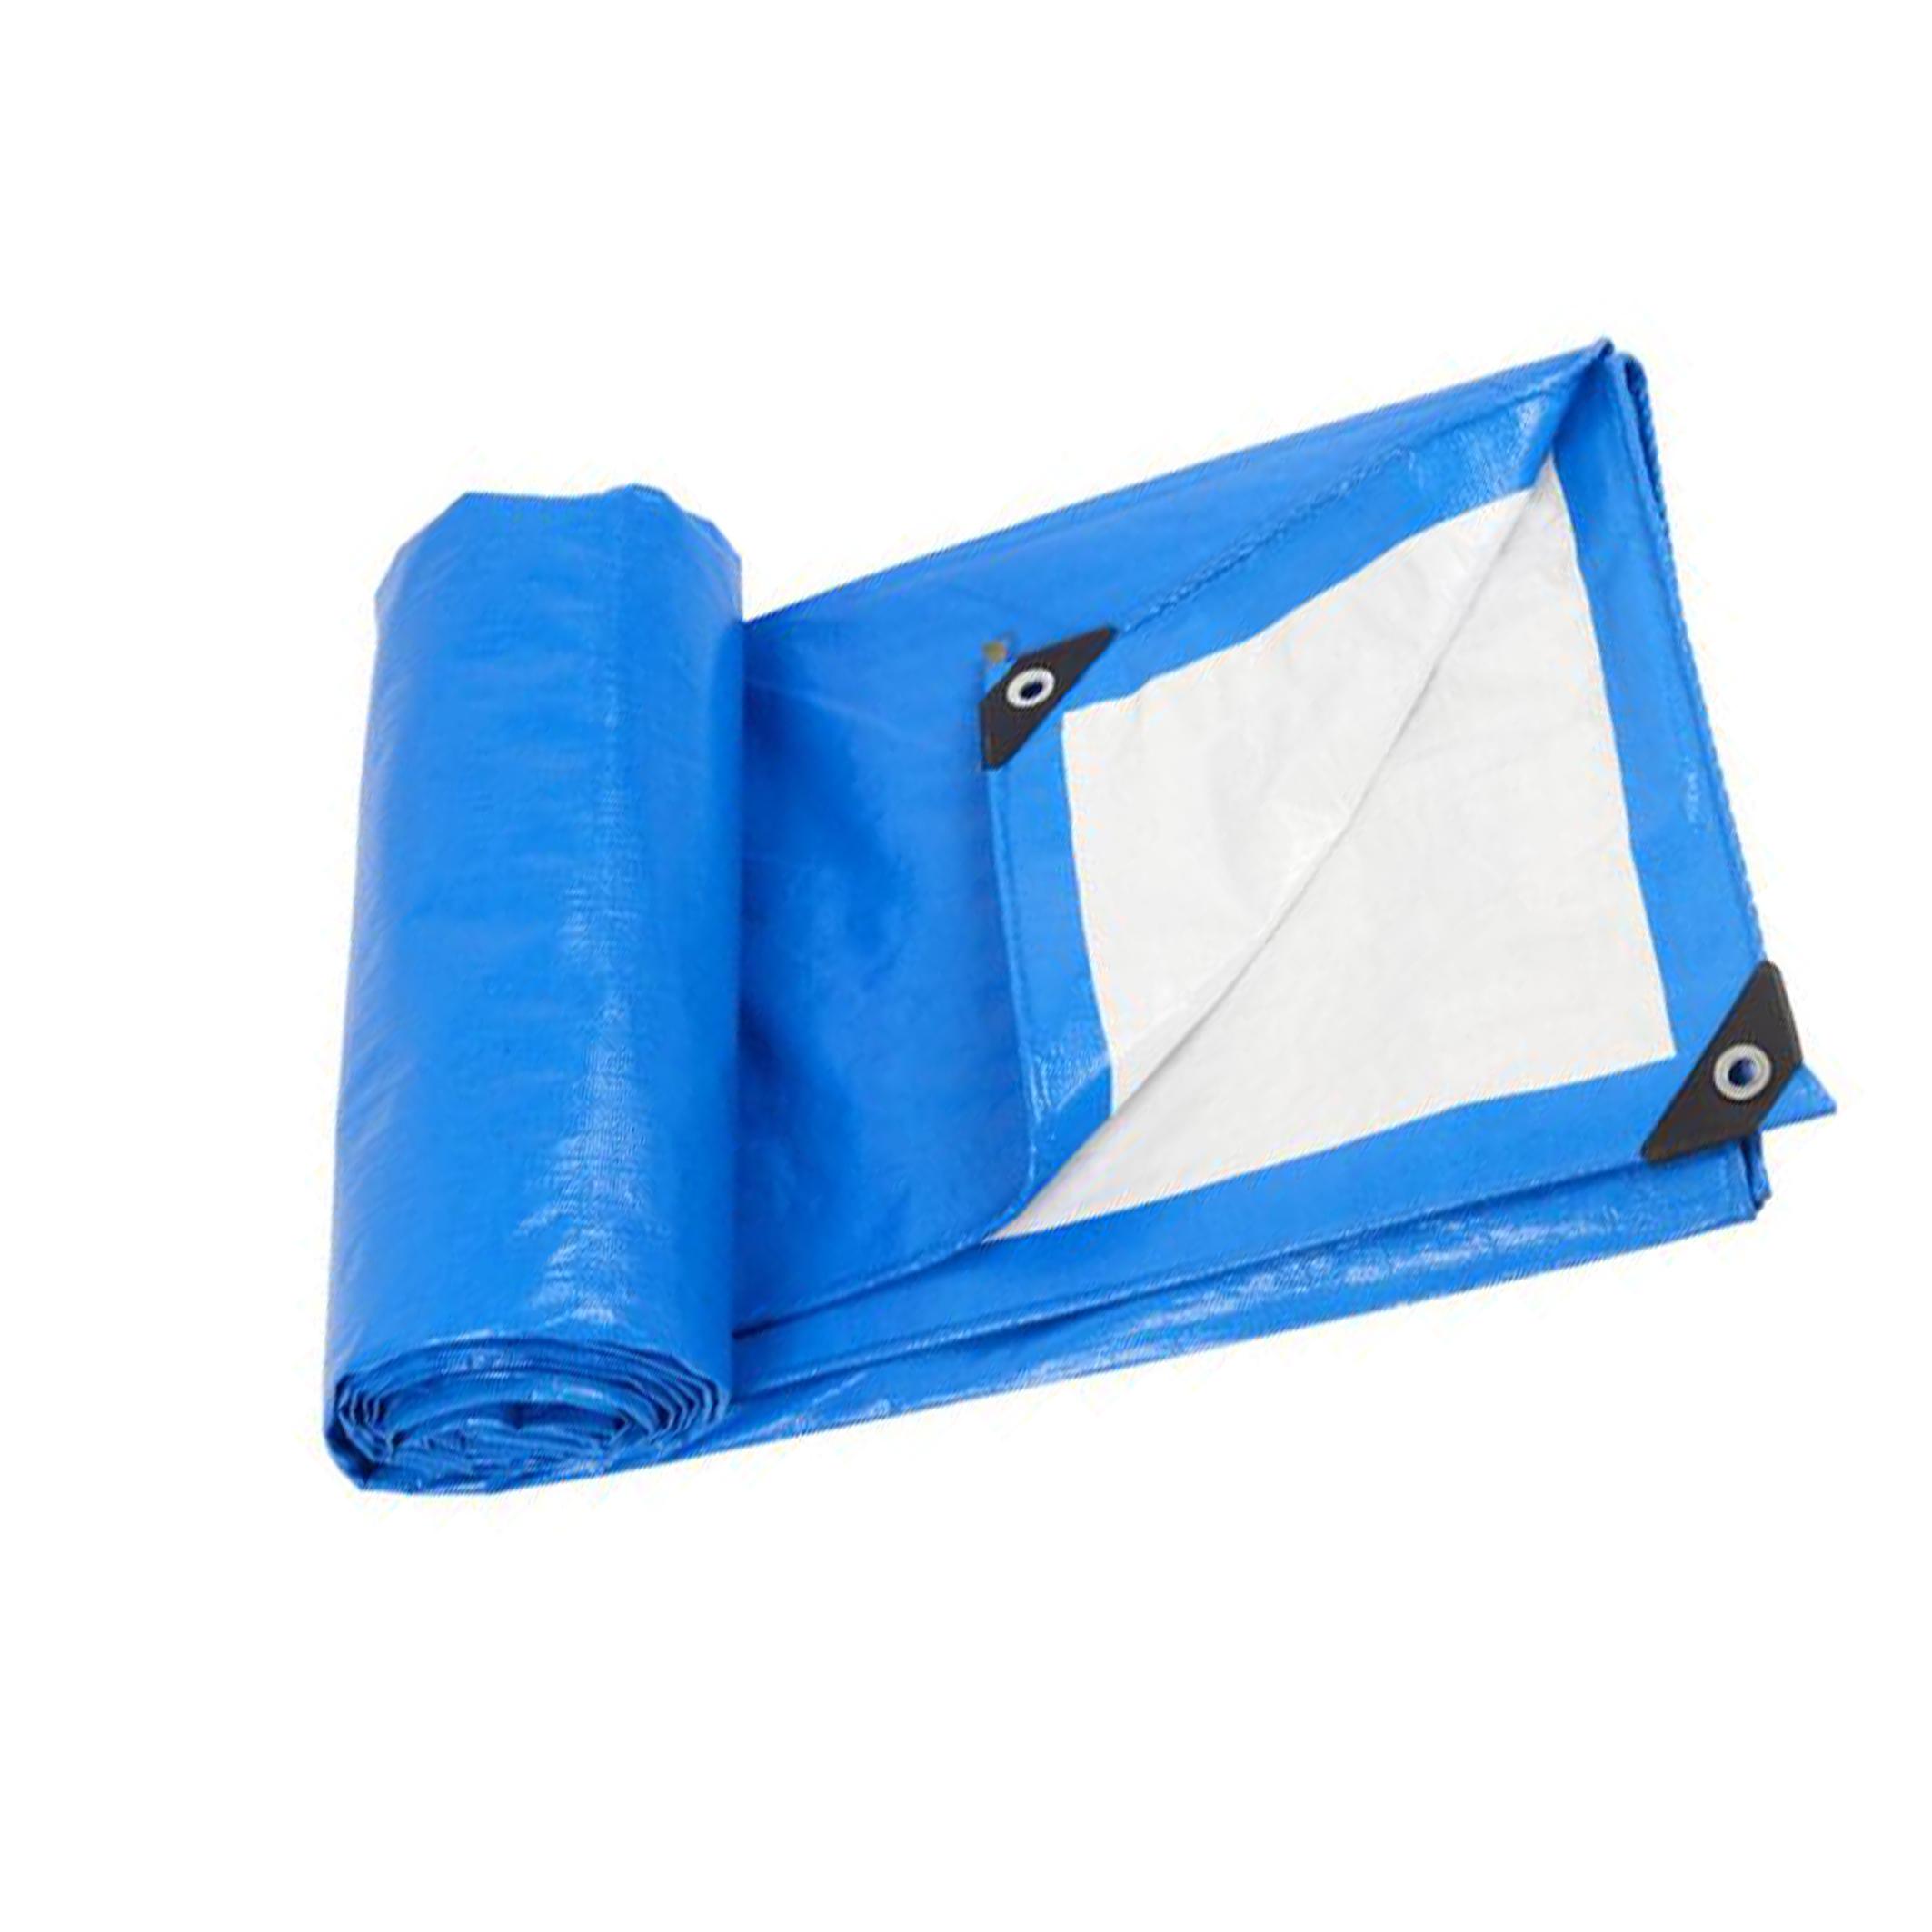 4x4 м водонепроницаемый защитный чехол из брезента